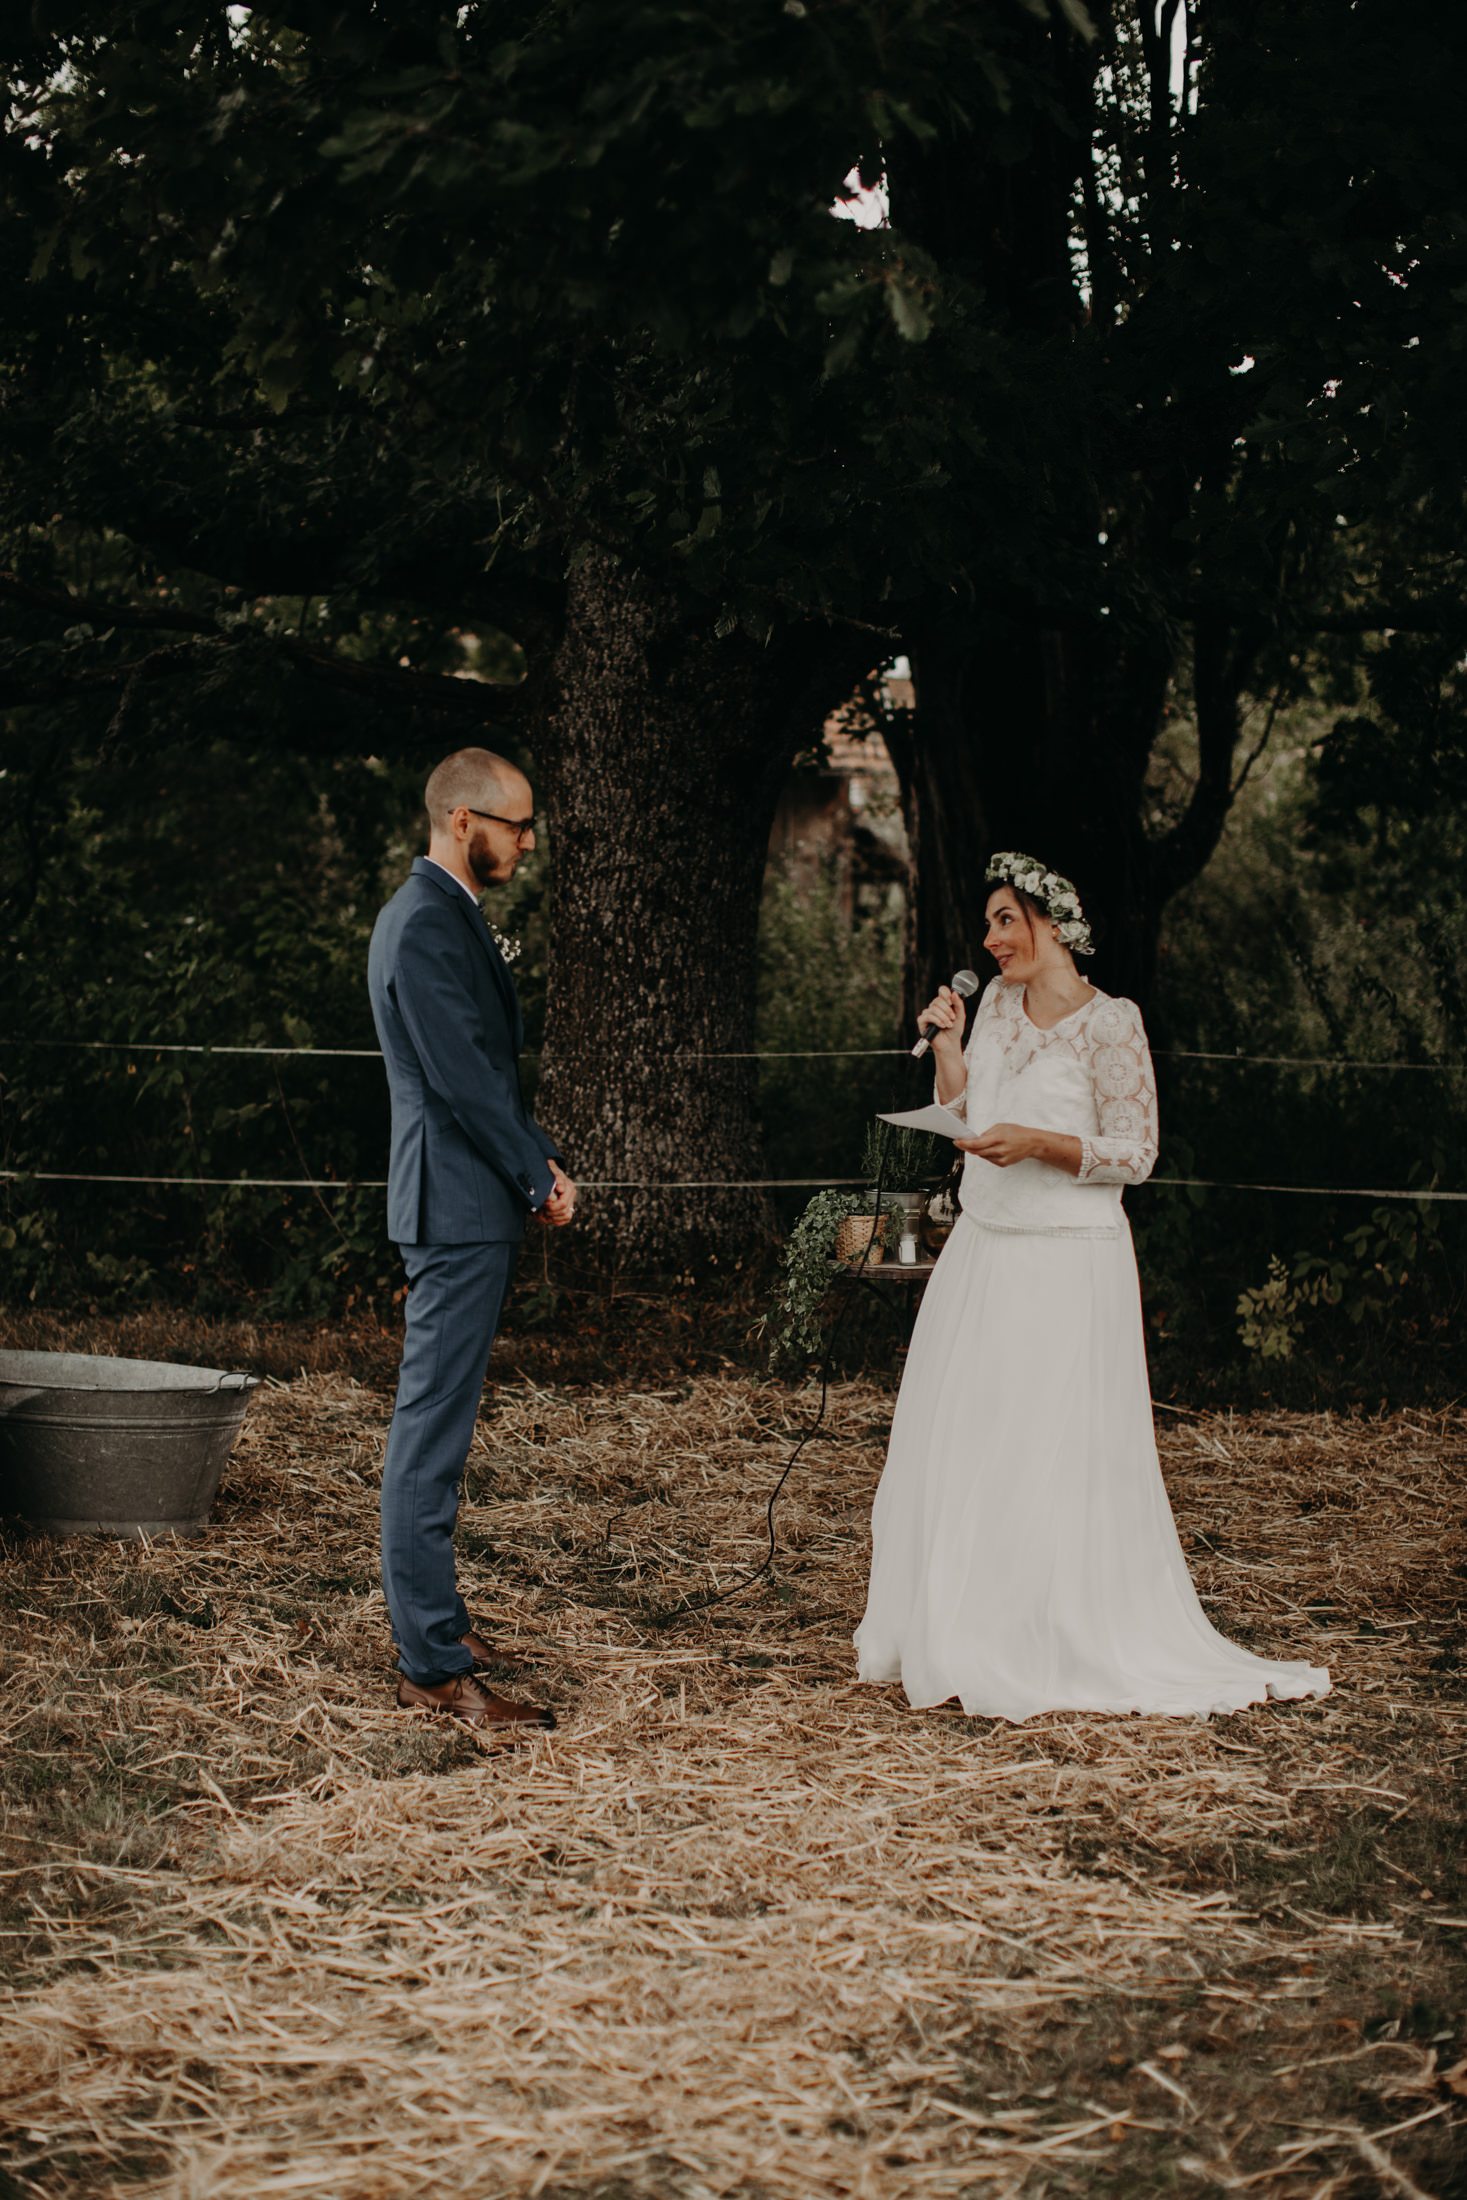 Mariage alsace germany wedding kid-44.jpg